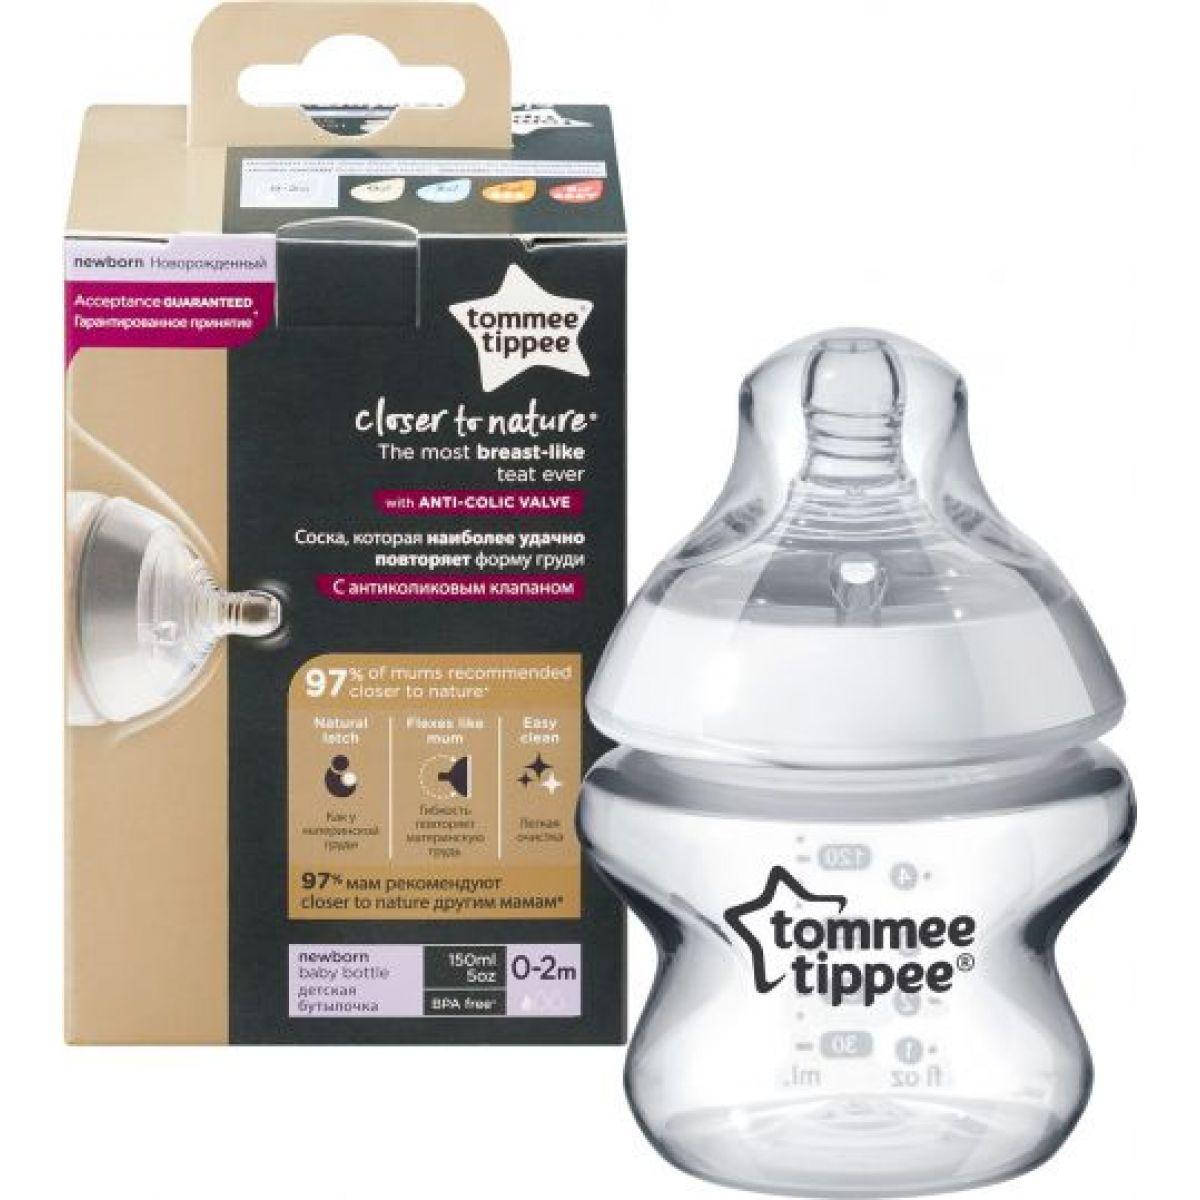 Tommee Tippee Dojčenská fľaša C2N 150ml